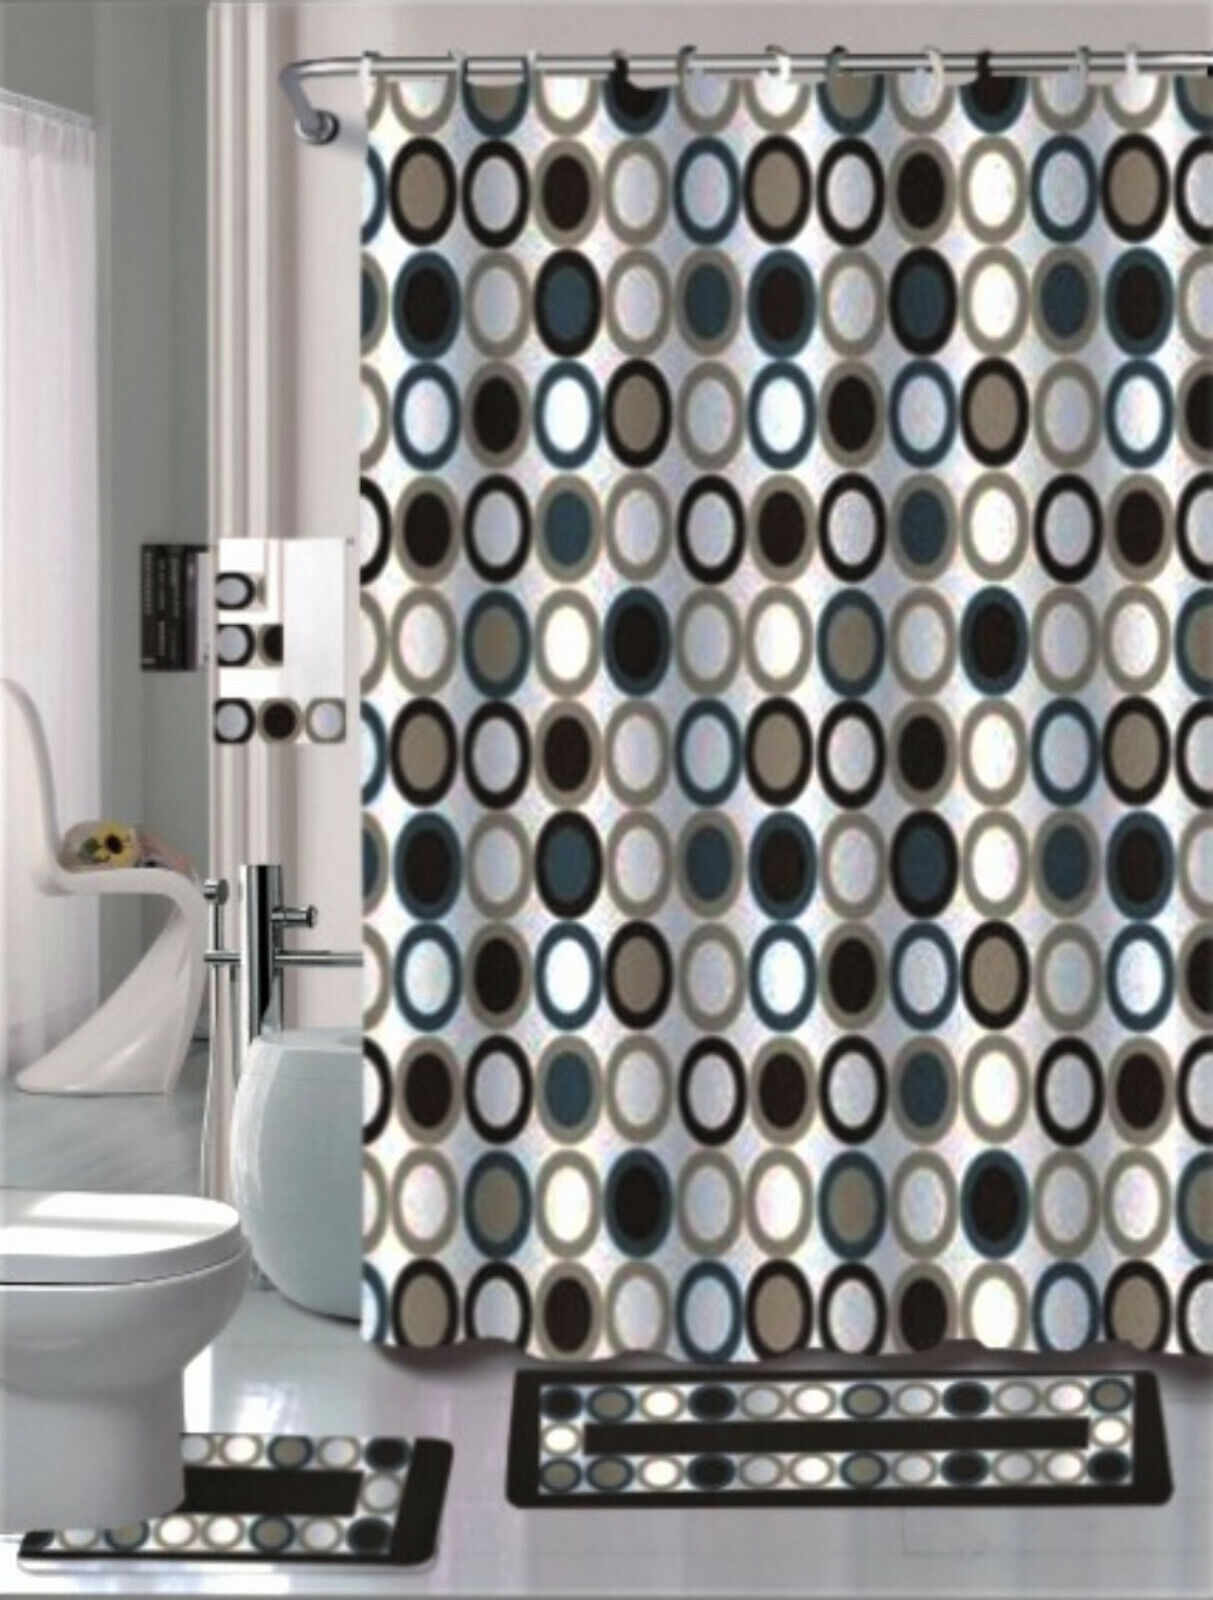 7PC Fishing Rod Reel Boat Bathroom Shower Curtain Bath Rug Towel Home Decor Set